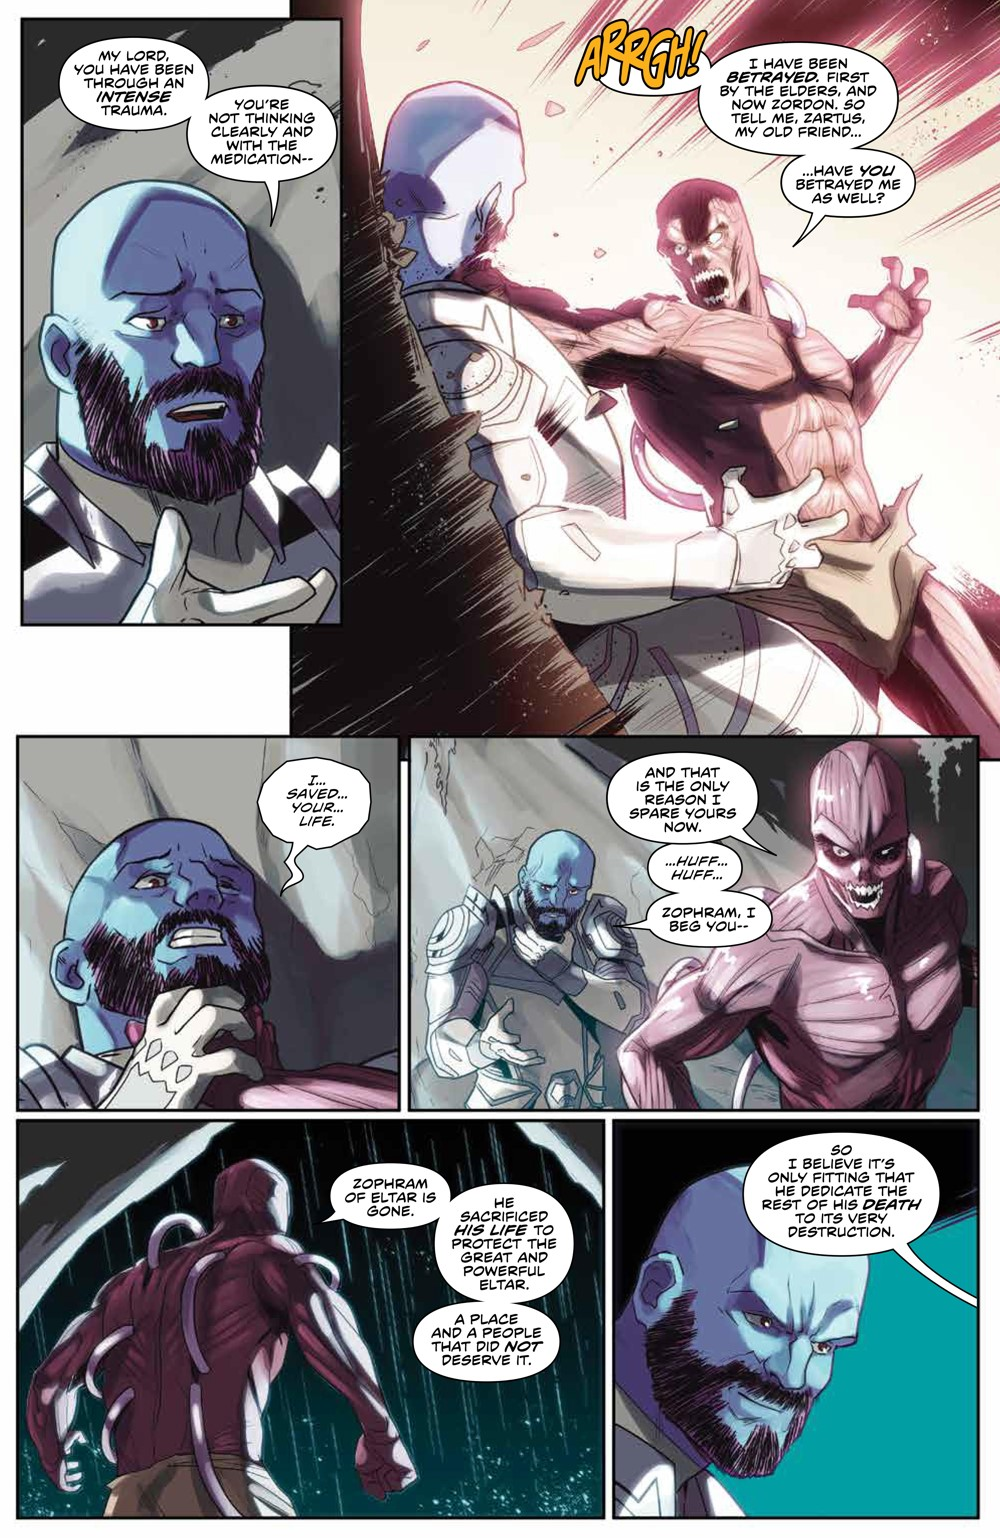 MightyMorphin_011_PRESS_5 ComicList Previews: MIGHTY MORPHIN #11